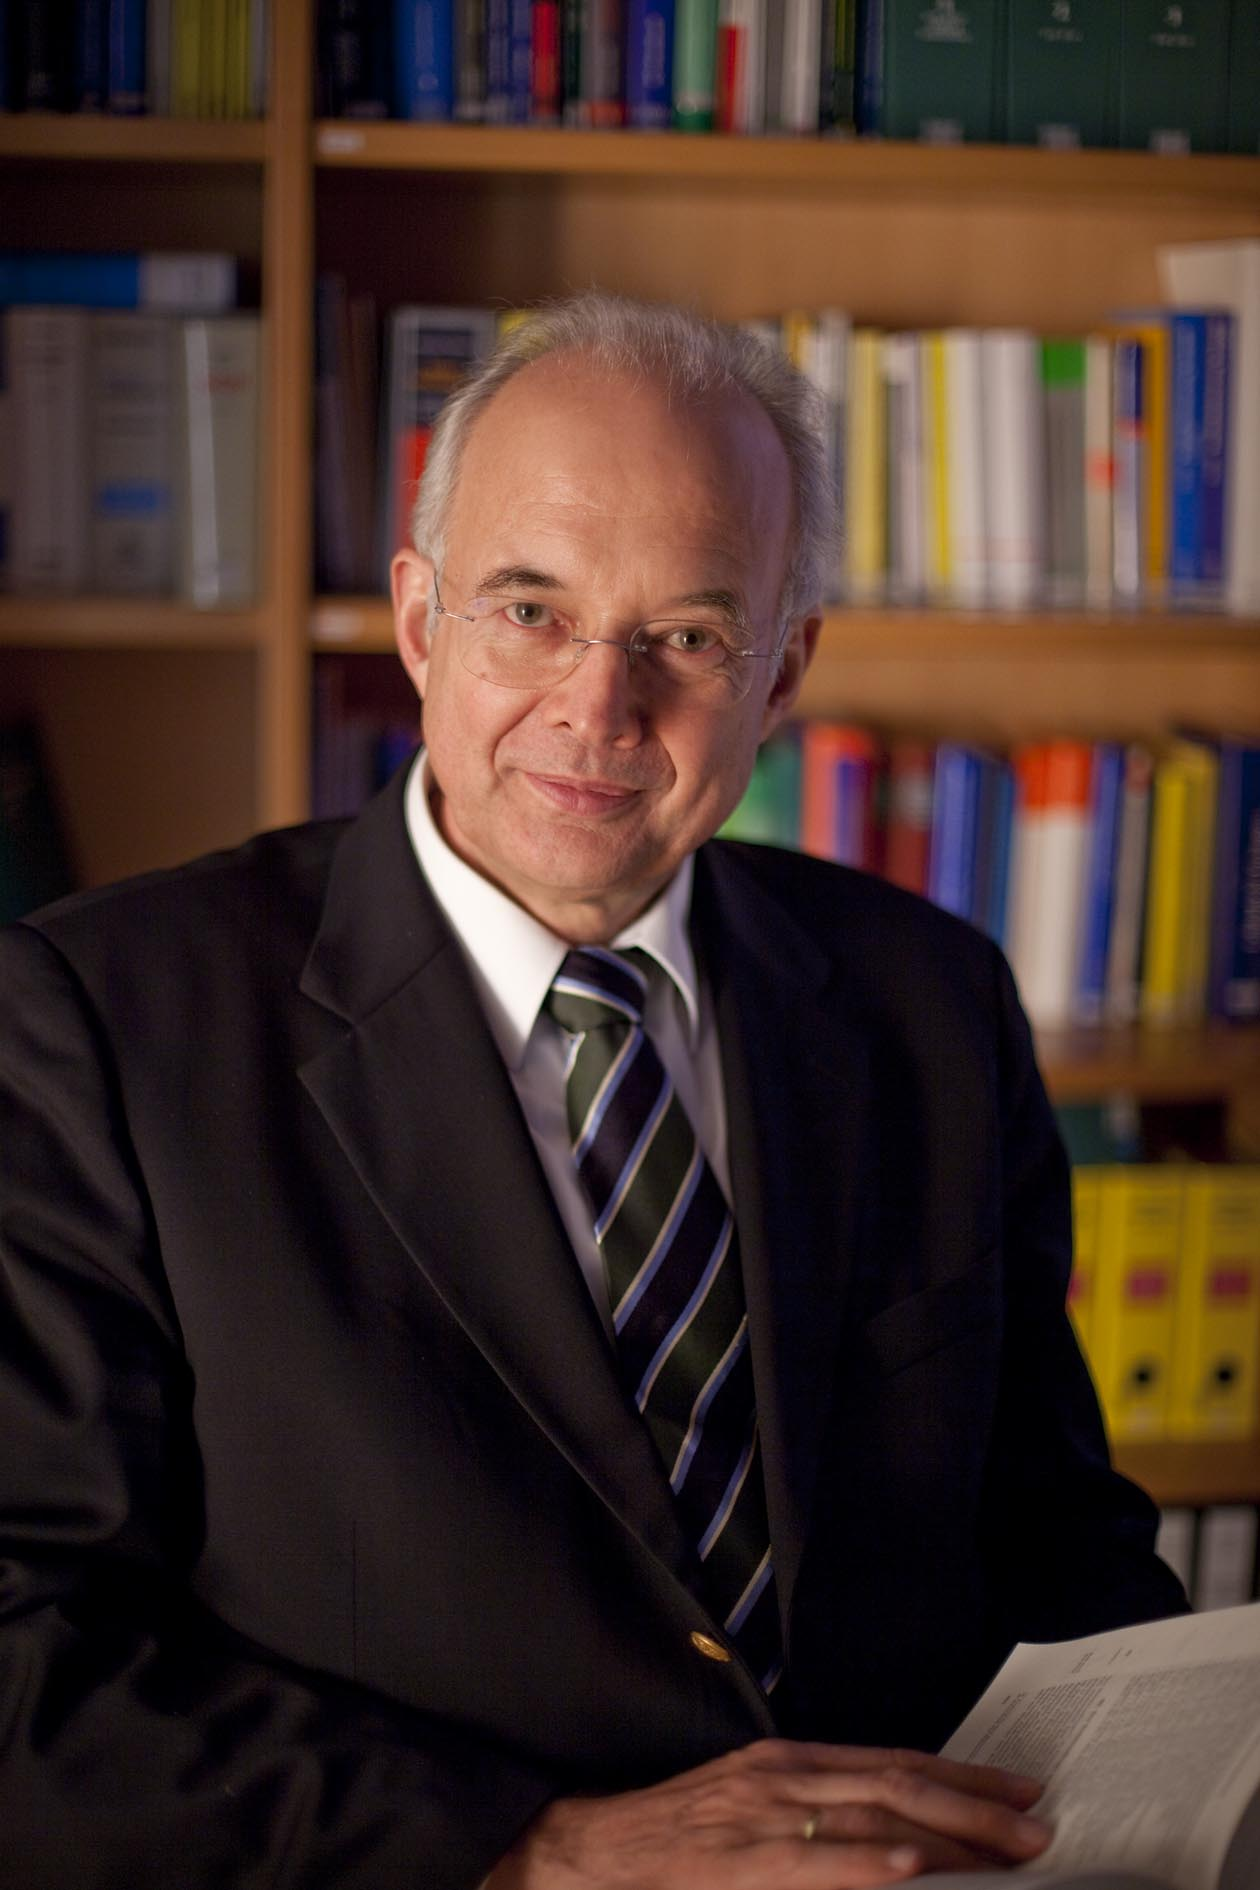 Prof. Dr. Dr. hc. Paul Kirchhof